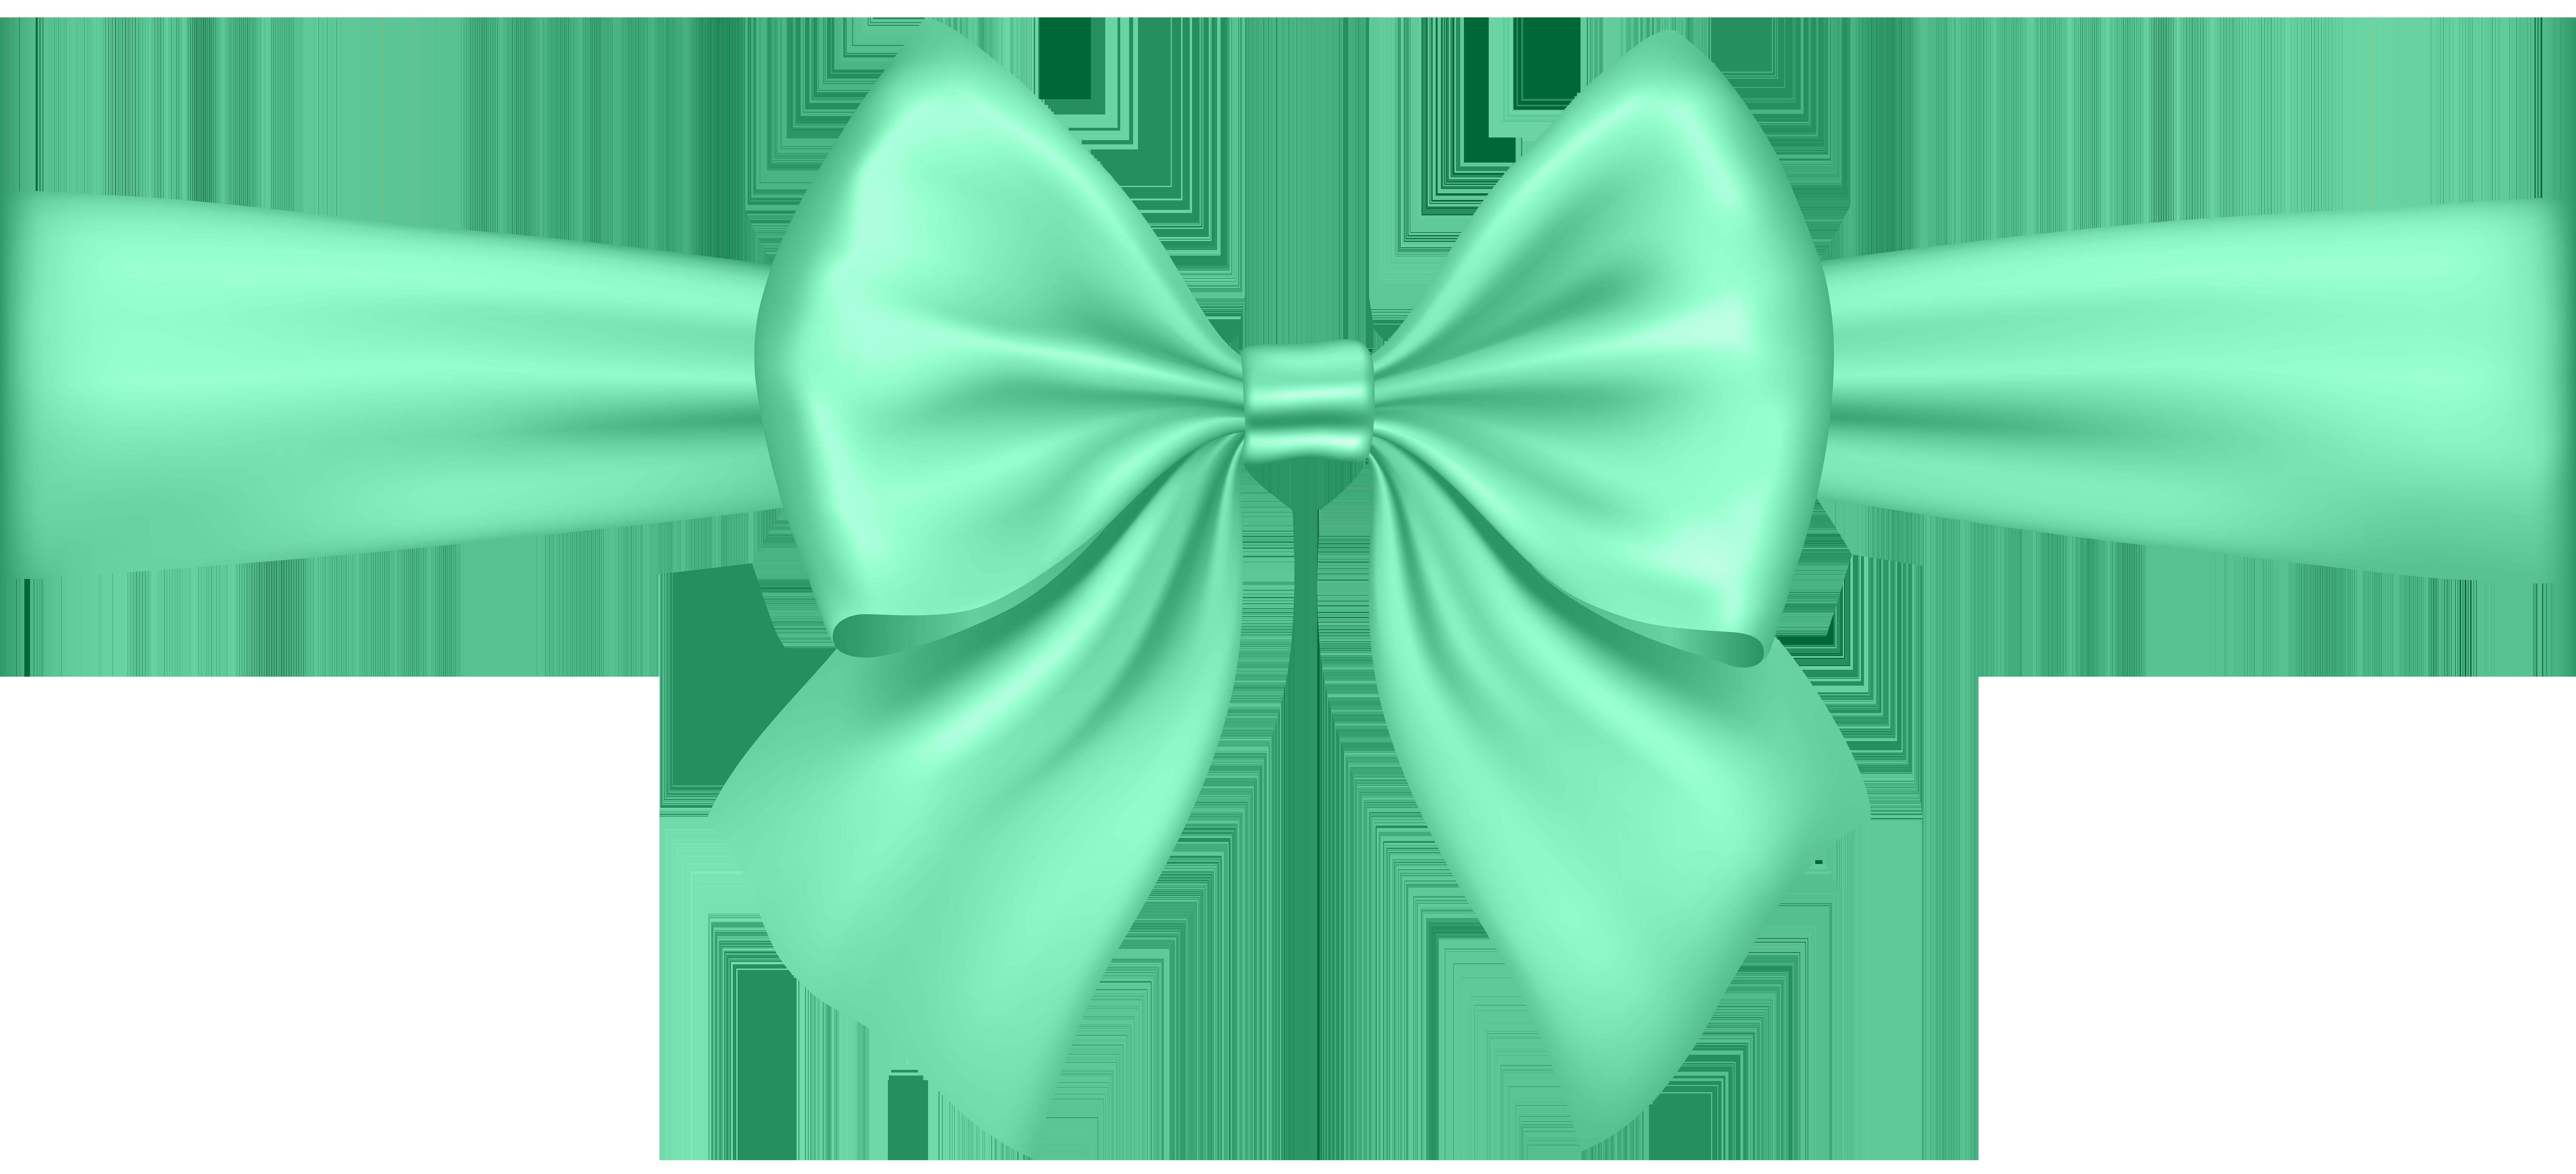 Knot clipart tie knot. Bow transparent png clip